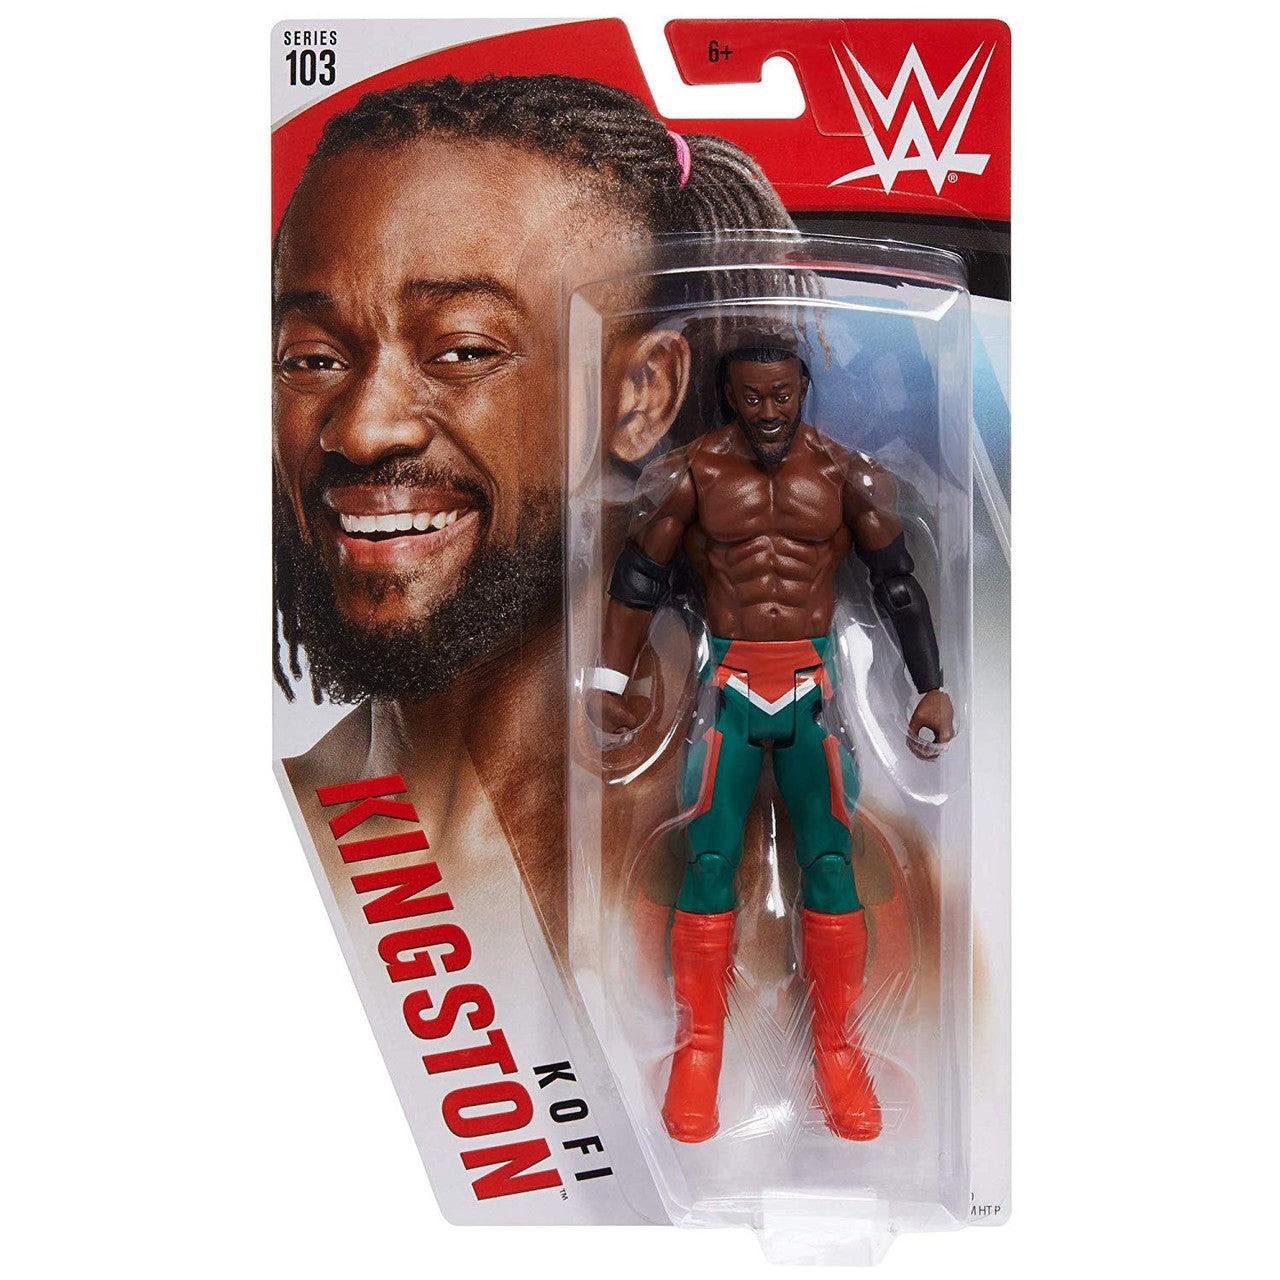 Image of WWE Basic Figure Series 103 - Kofi Kingston